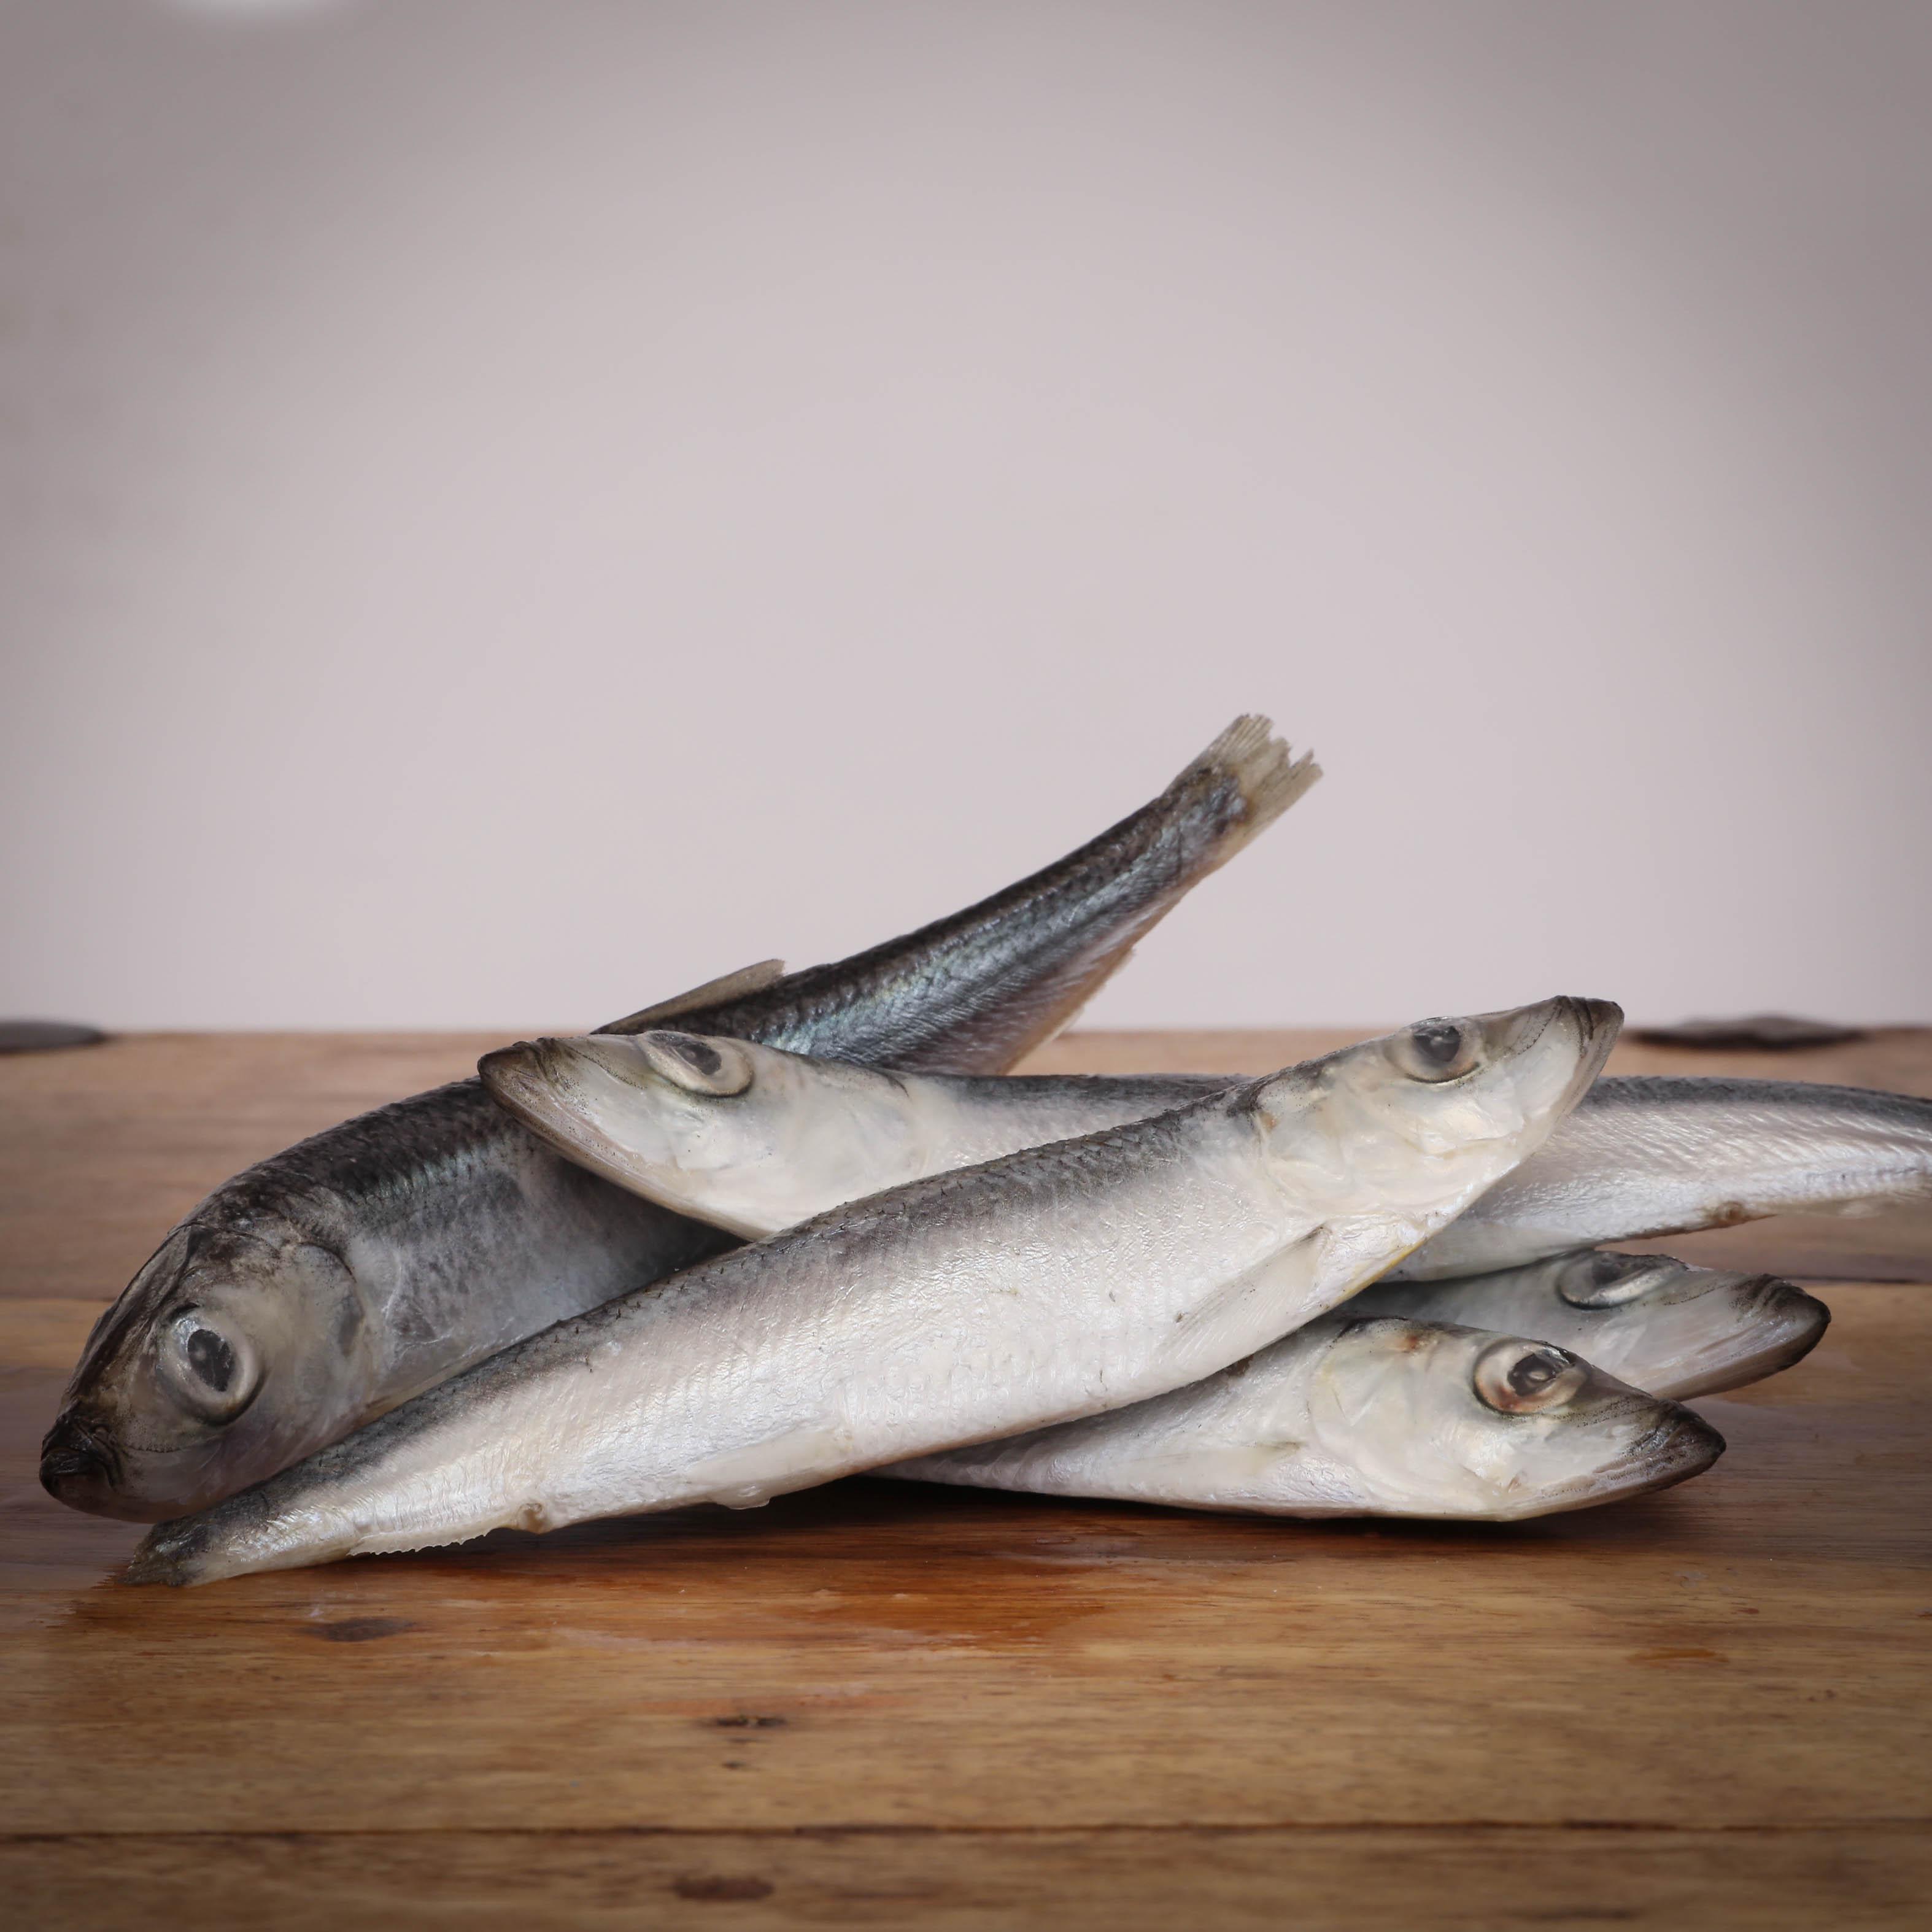 Heringe, ganze Fische 15-18cm, lose für Greifvögel